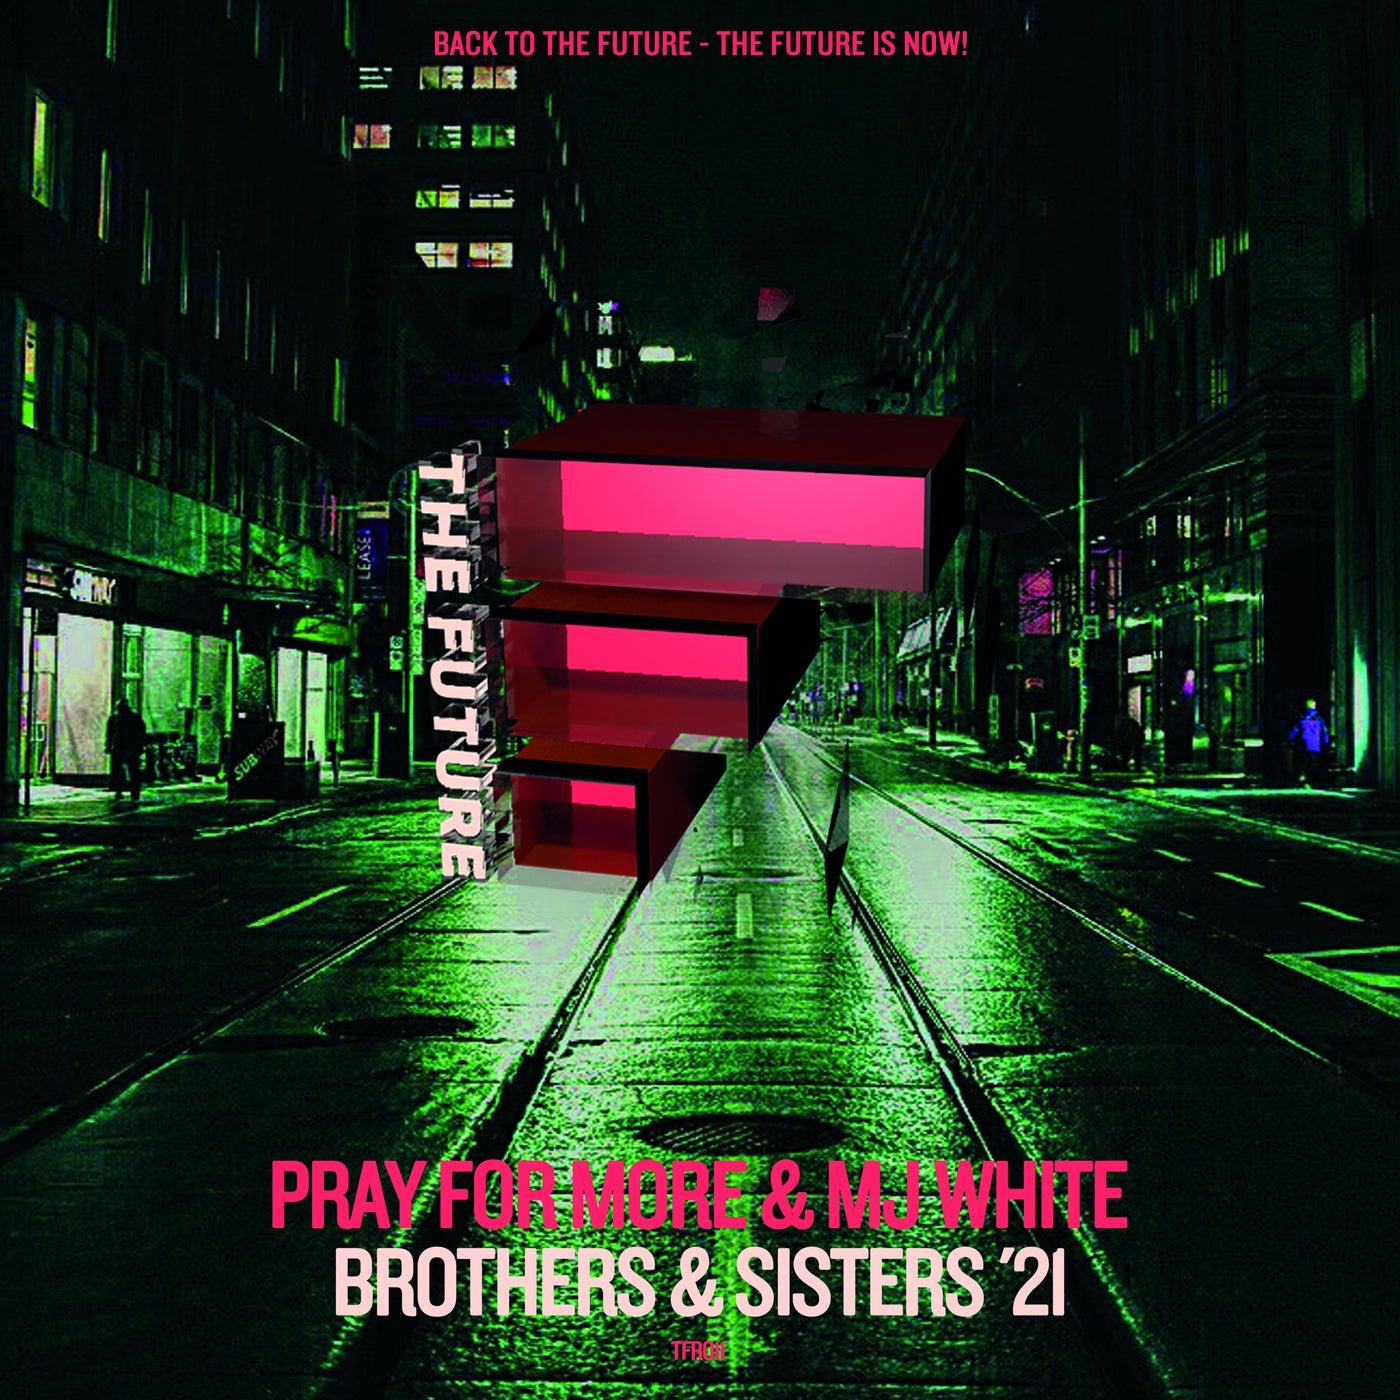 Brothers & Sisters (Dirty Secretz Remix)